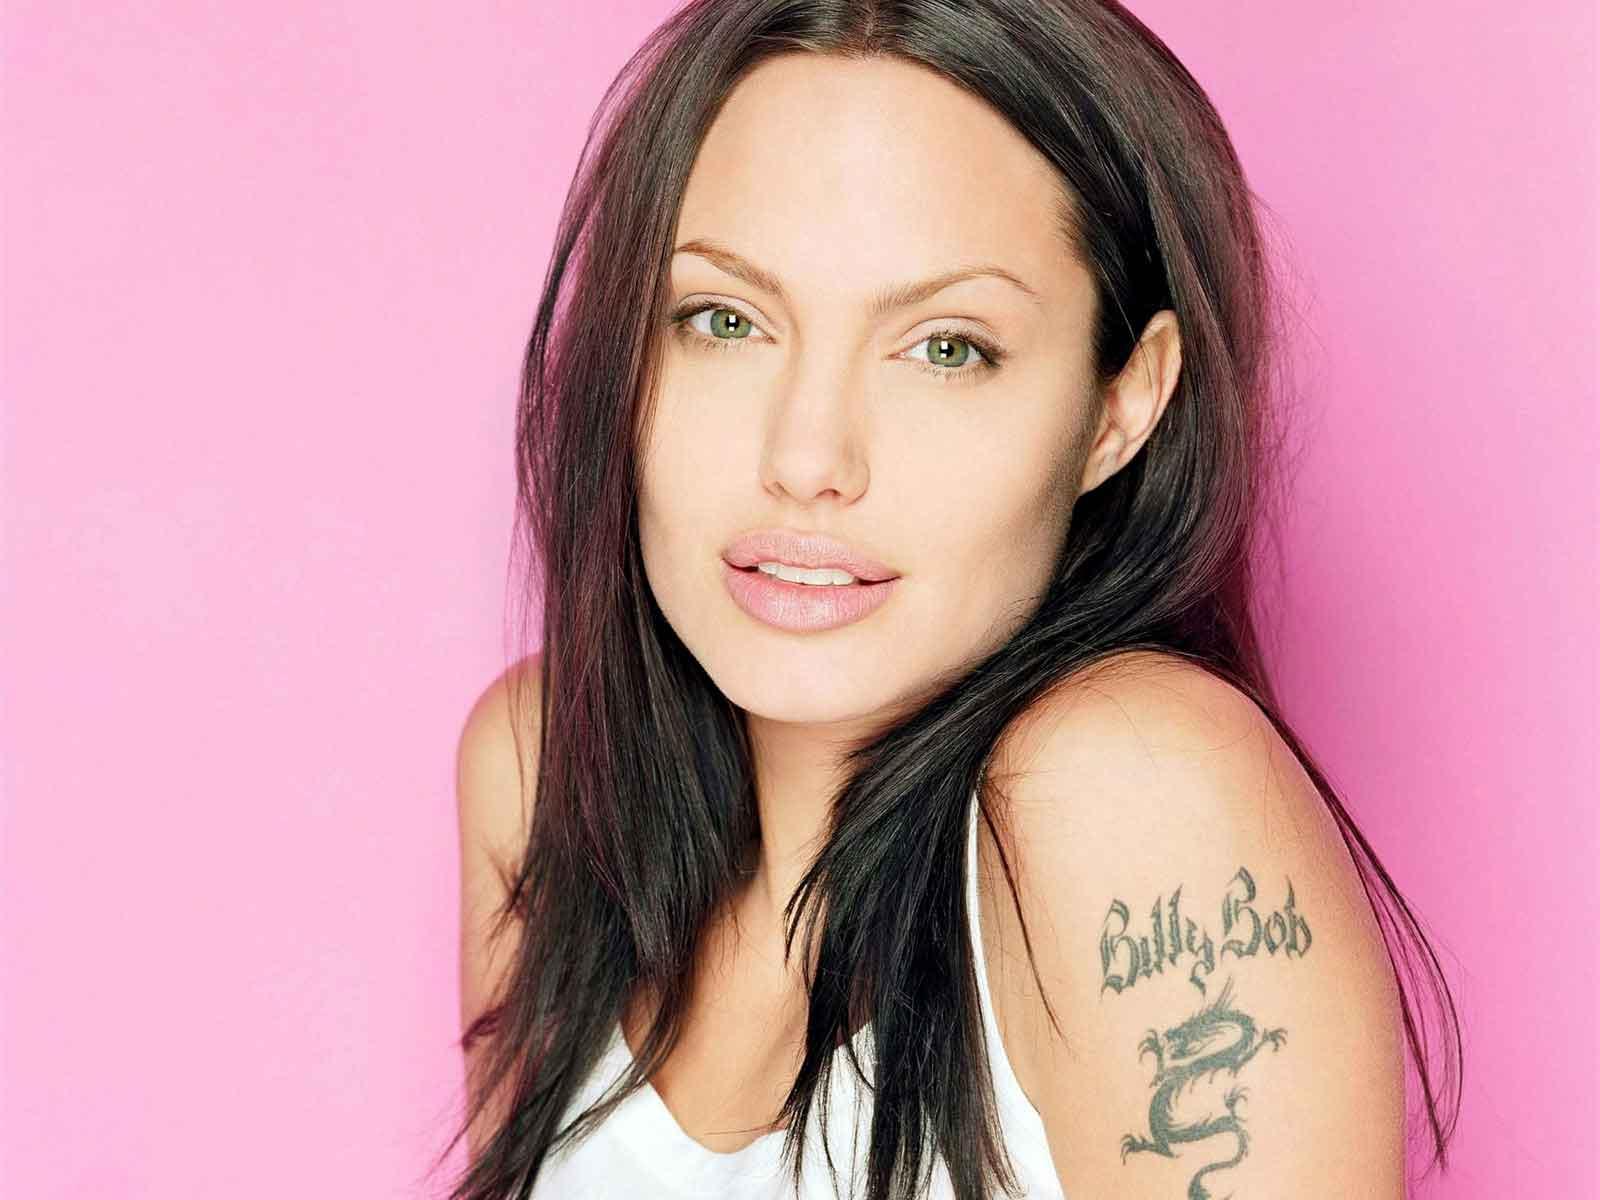 http://4.bp.blogspot.com/-5dU_RXRkZhM/T4rHj5EdKlI/AAAAAAAAAKM/FDR_GFLkUd4/s1600/Angelina+Jolie+Tattoos+Arm.jpg